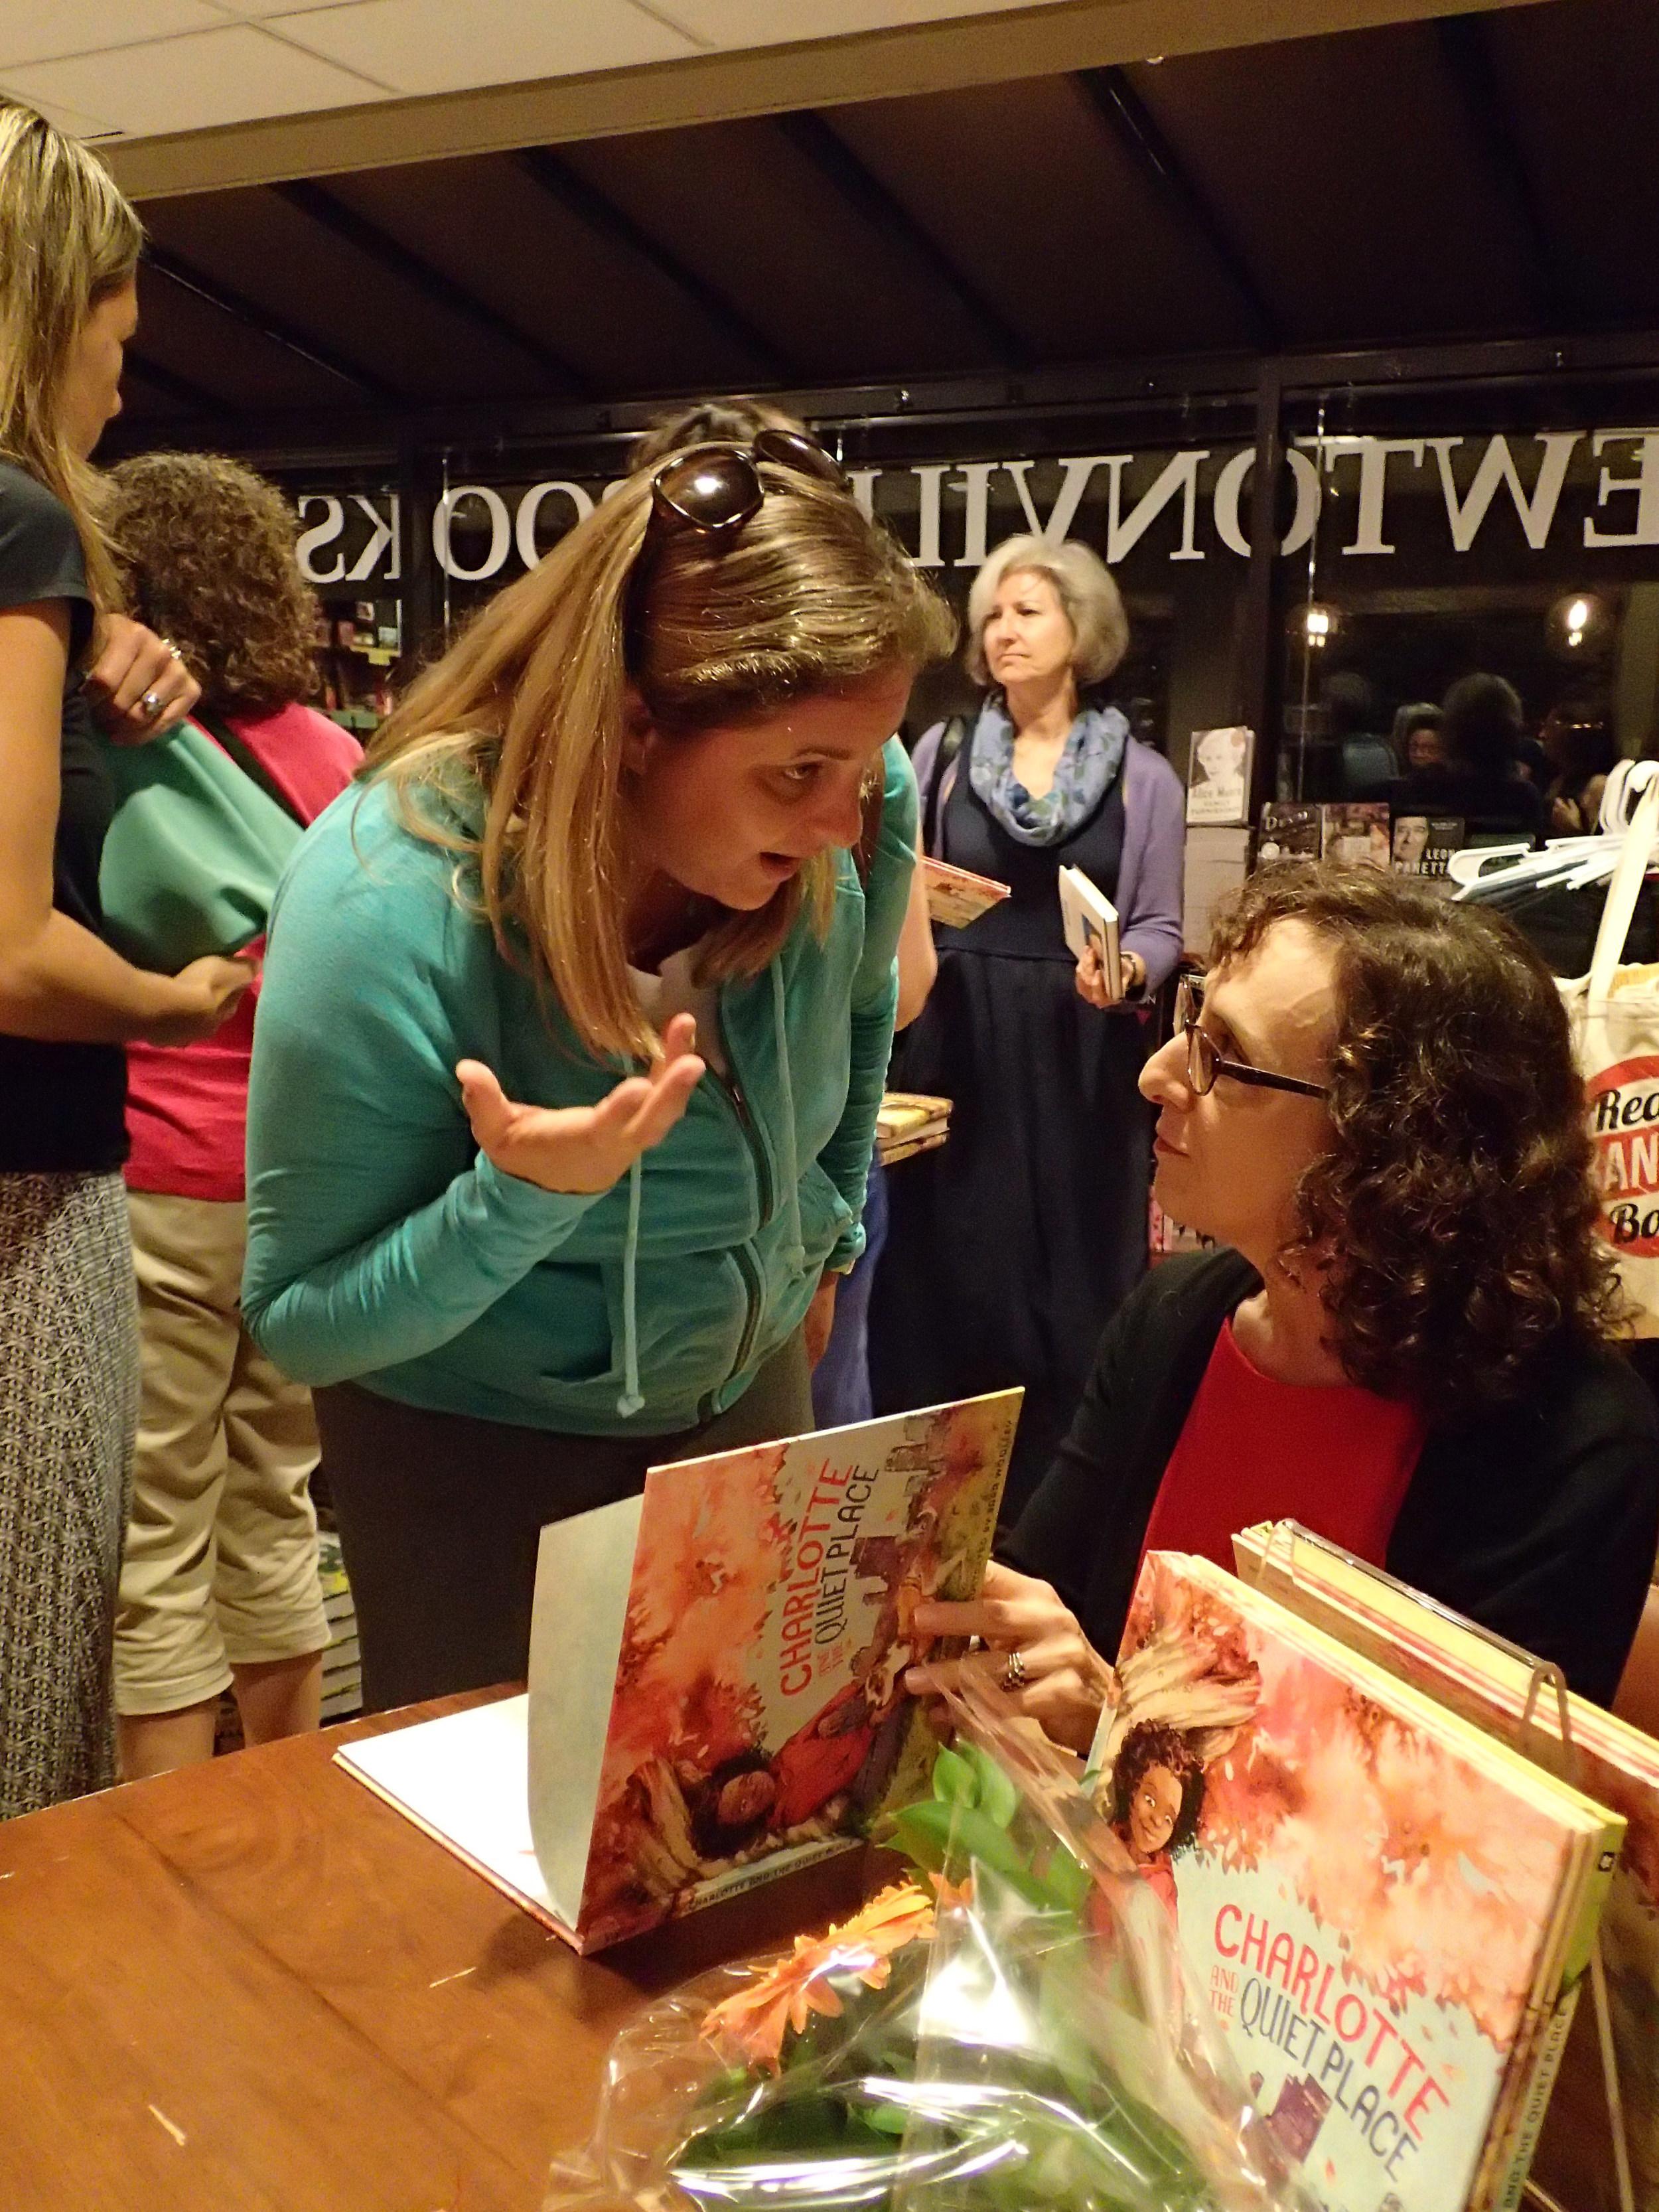 With fellow mindfulness author Carla Naumburg